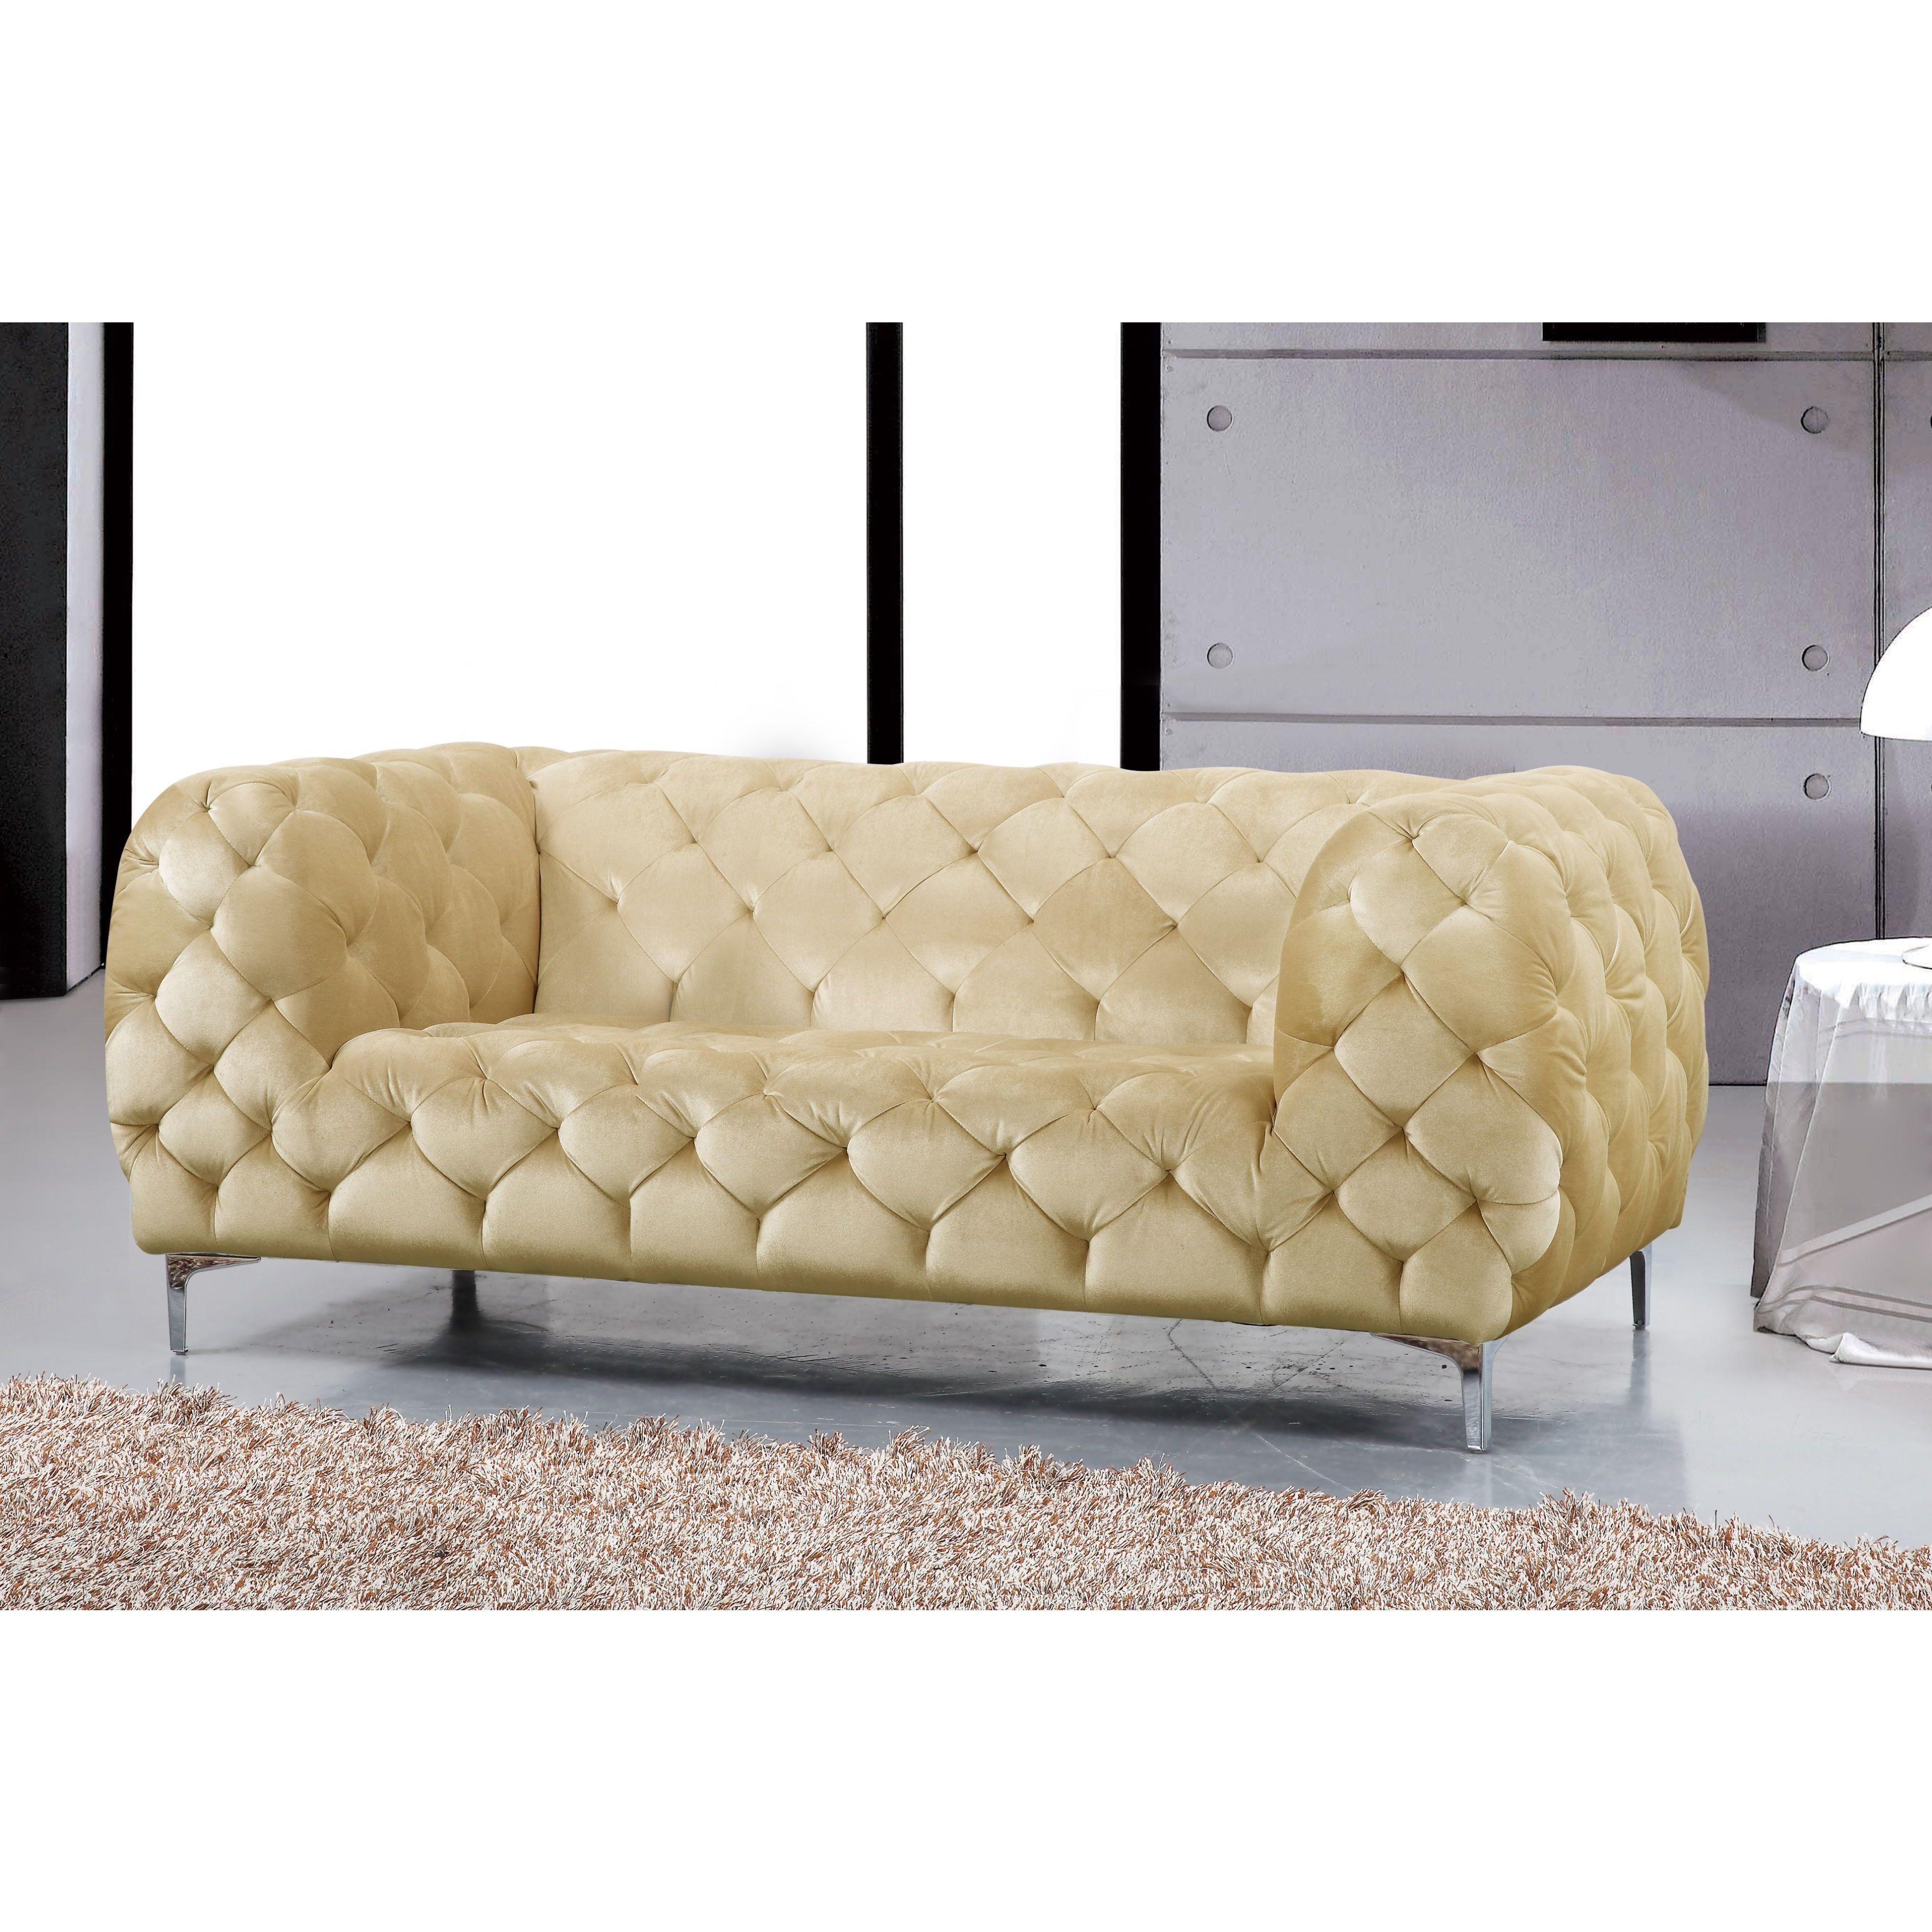 Shop Meridian Mercer Beige Velvet 4 Piece Furniture Set – Free With Regard To Mercer Foam Oversized Sofa Chairs (View 11 of 25)